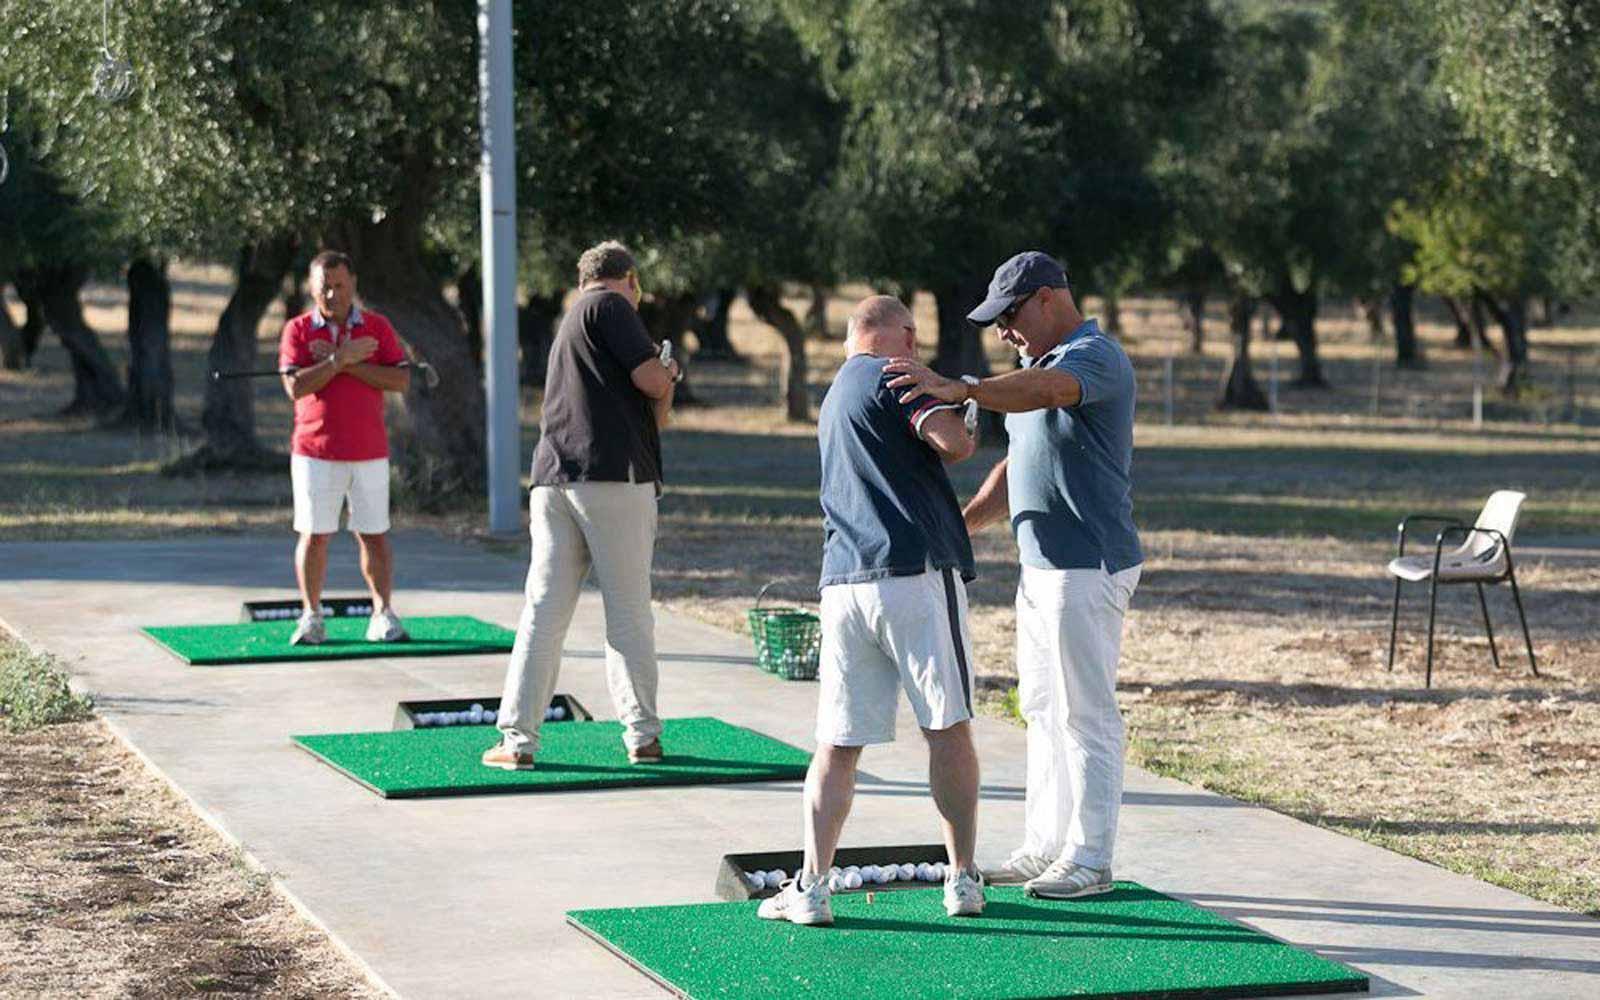 Golf lessons at the Gattarella Resort